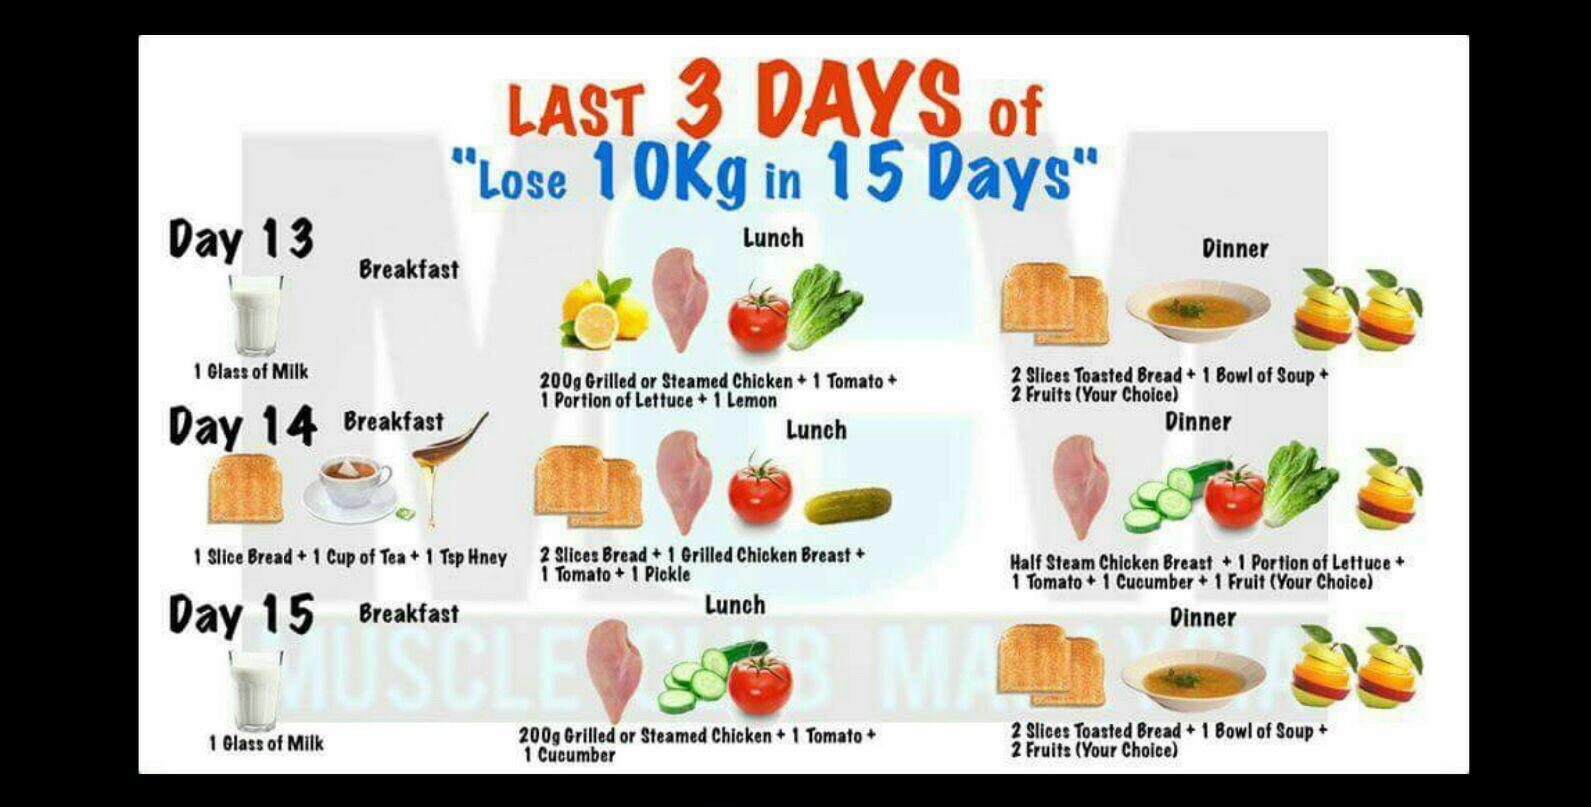 20 Sayuran Untuk Diet Cepat Kurus sebagai Cara Alami Turunkan Berat Badan